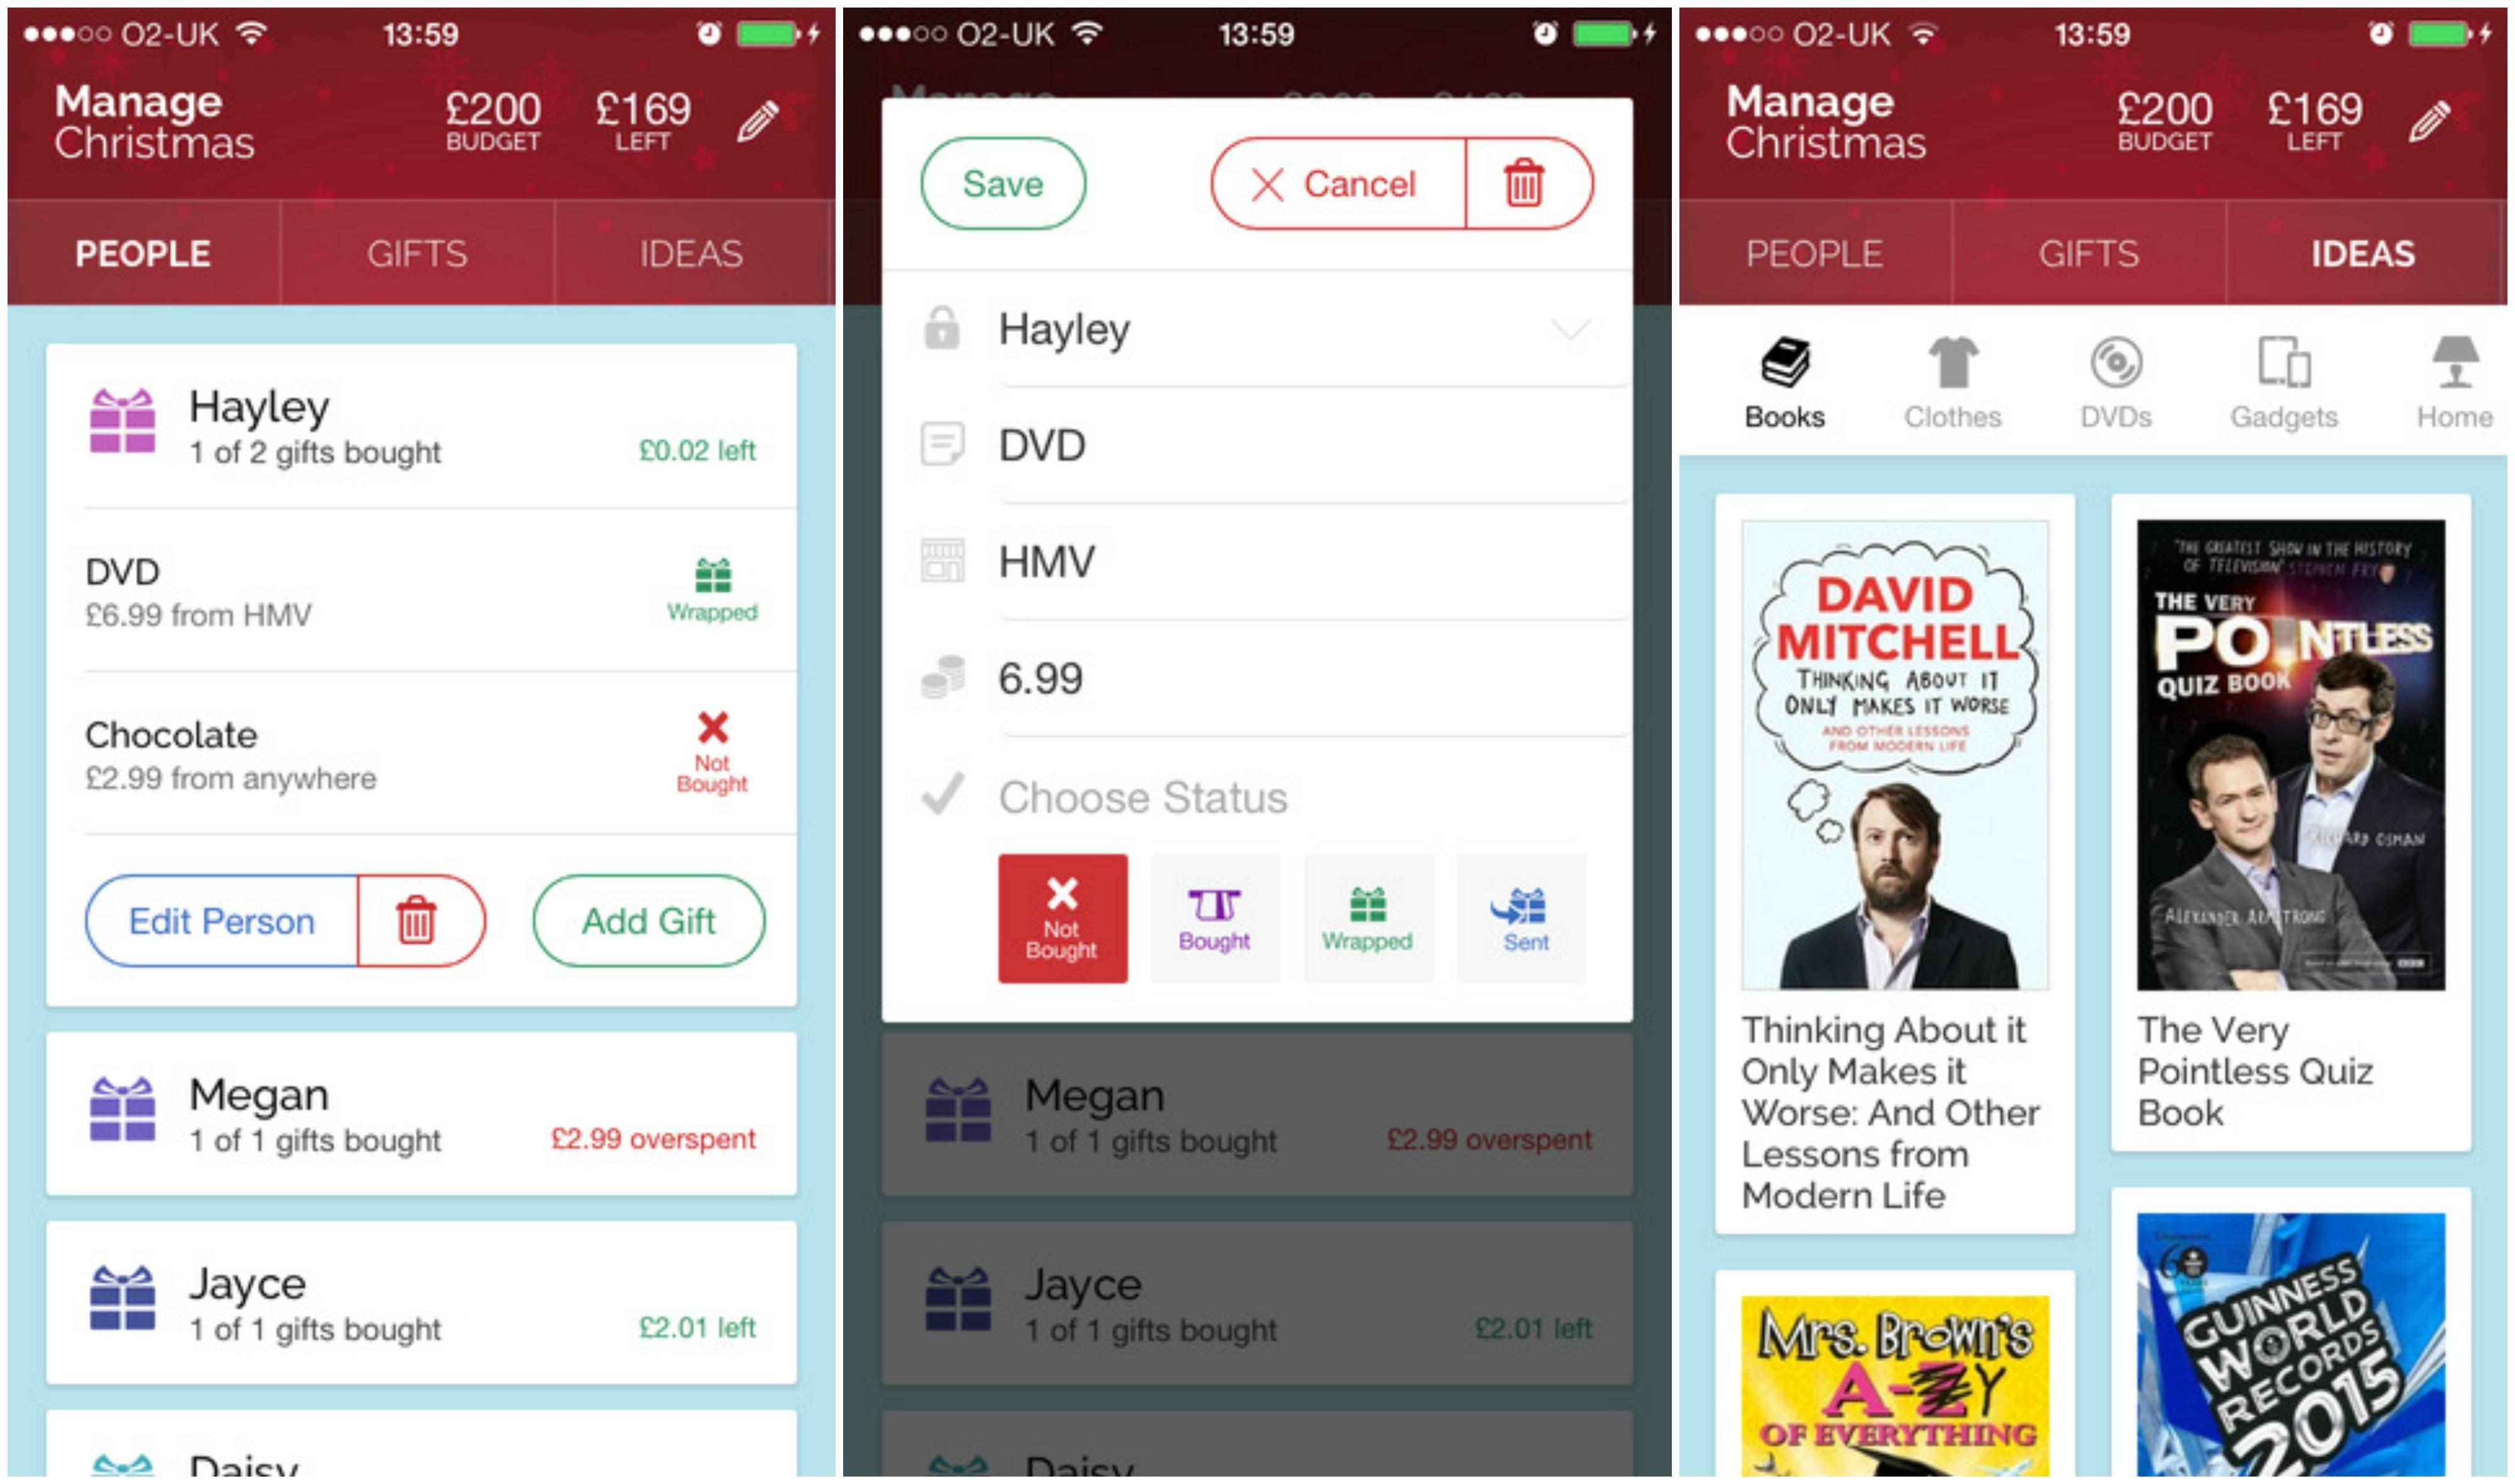 manage-christmas-app